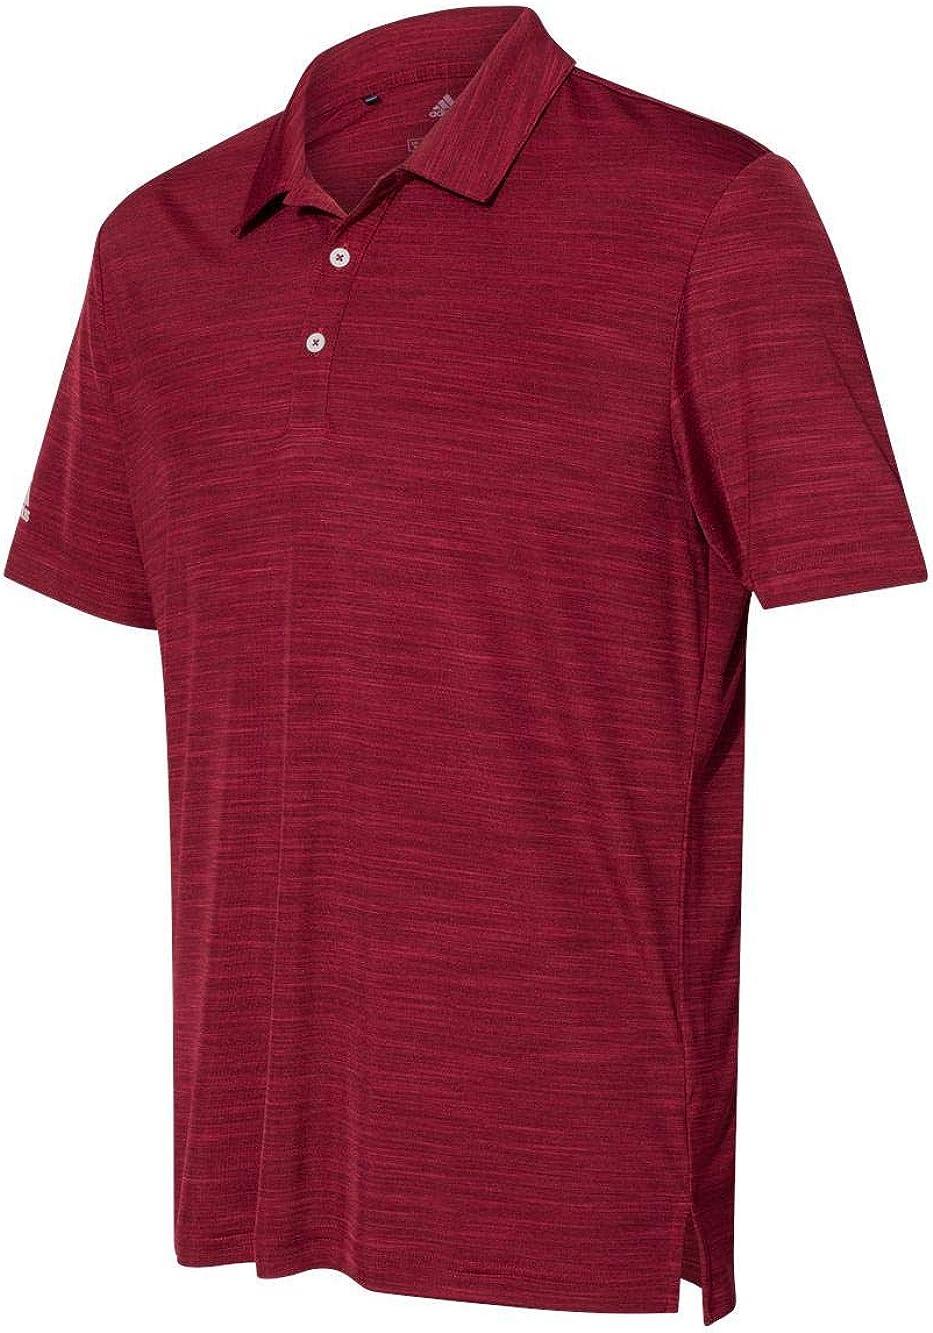 Mens Melange Sport Shirt Sacramento Mall -Collegiate A402 -M Challenge the lowest price